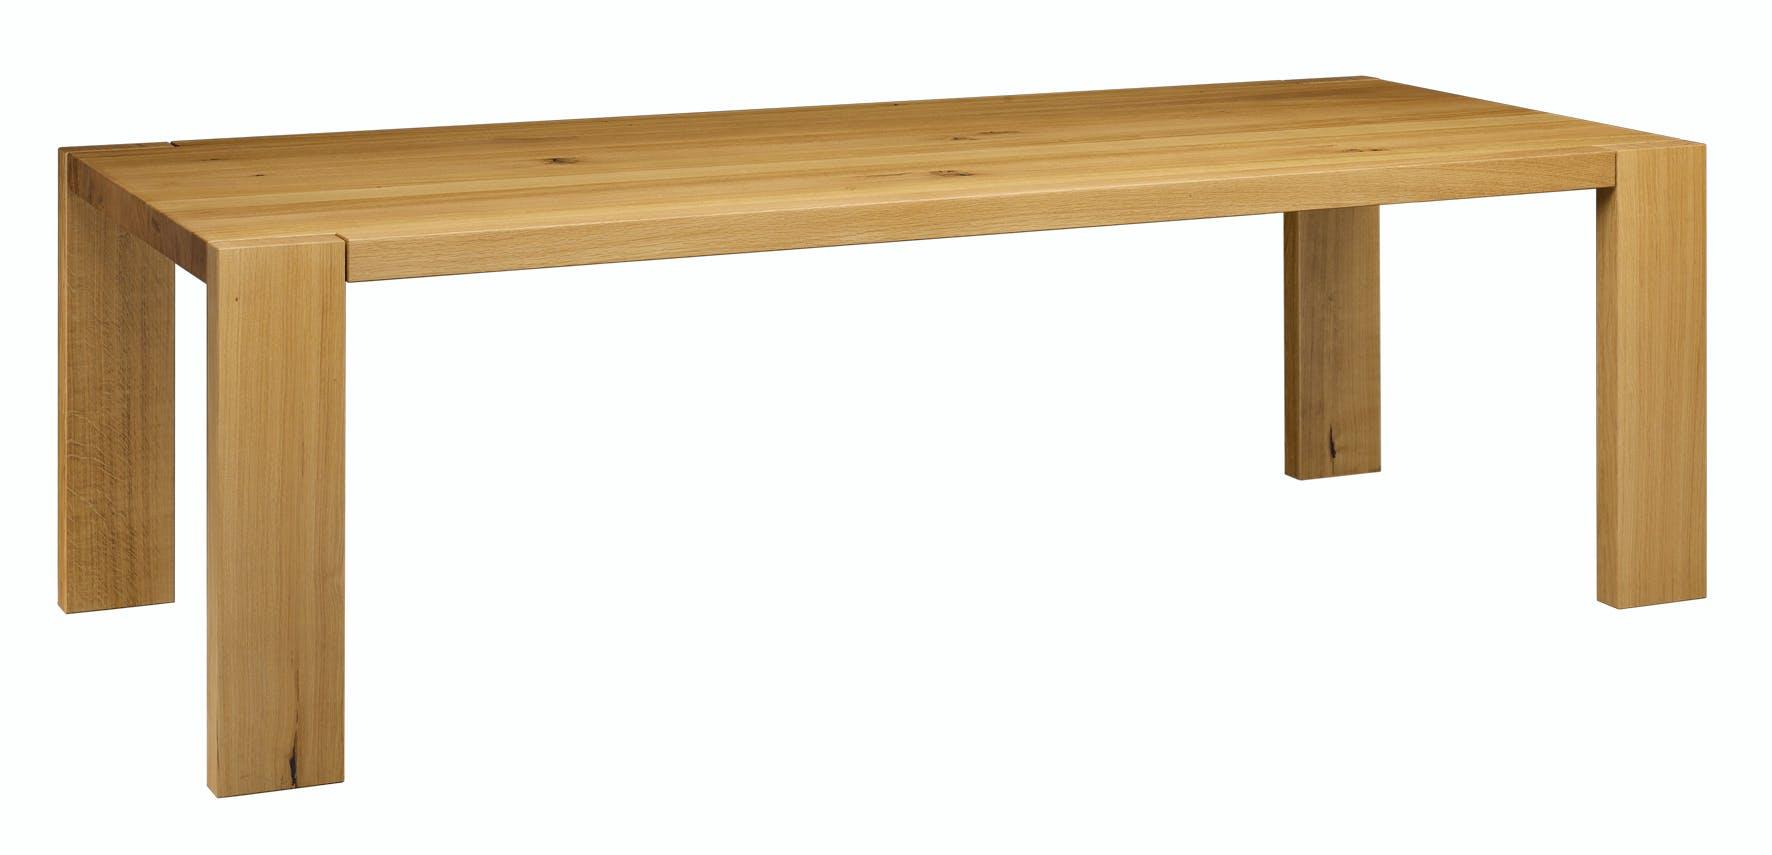 E15-furniture-london-table-angle-haute-living